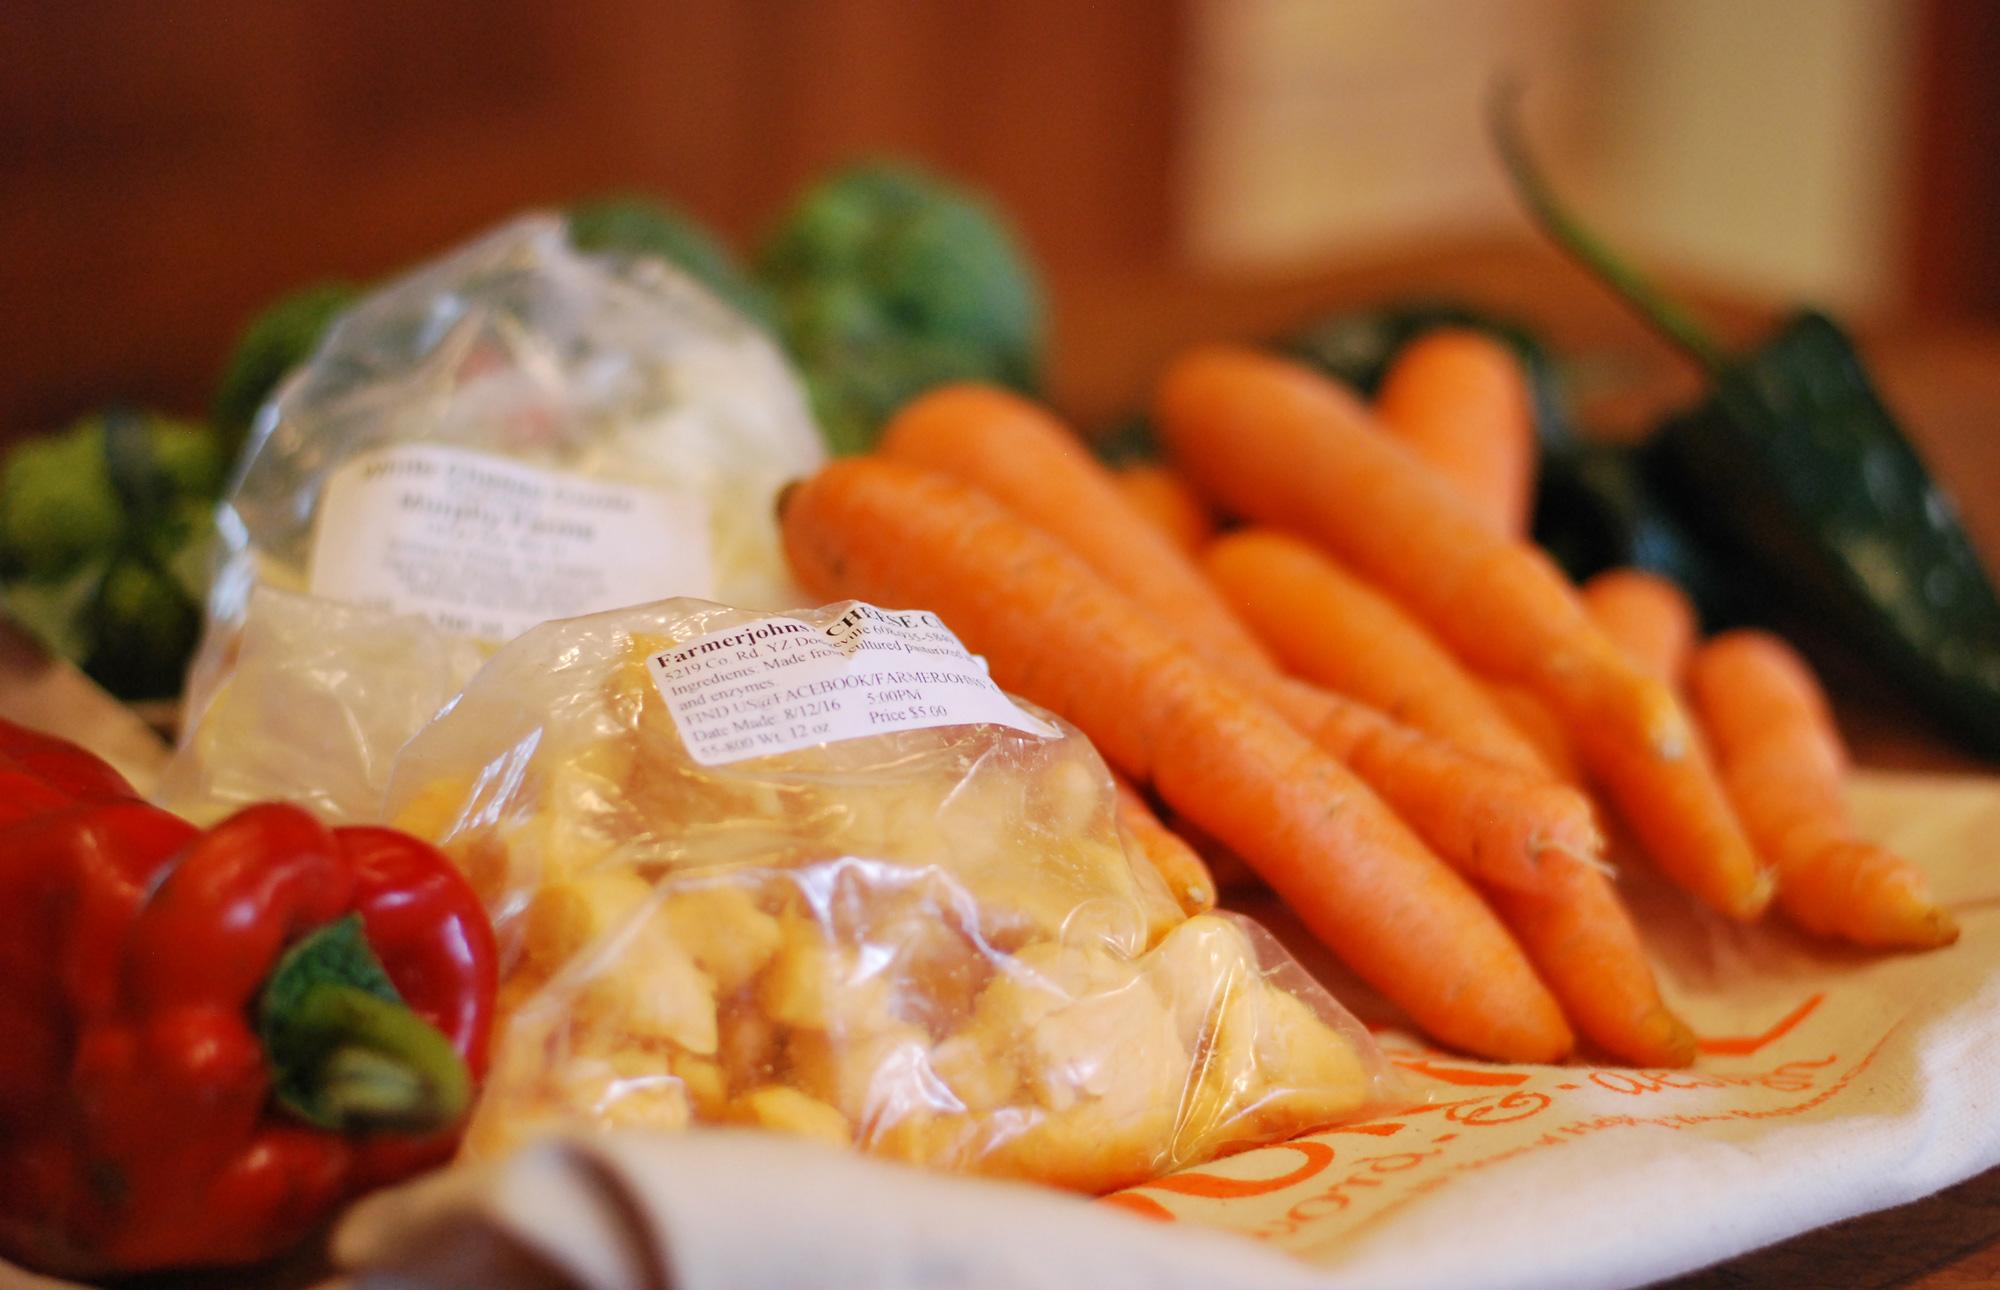 fresh produce from Wisconsin farmers markets